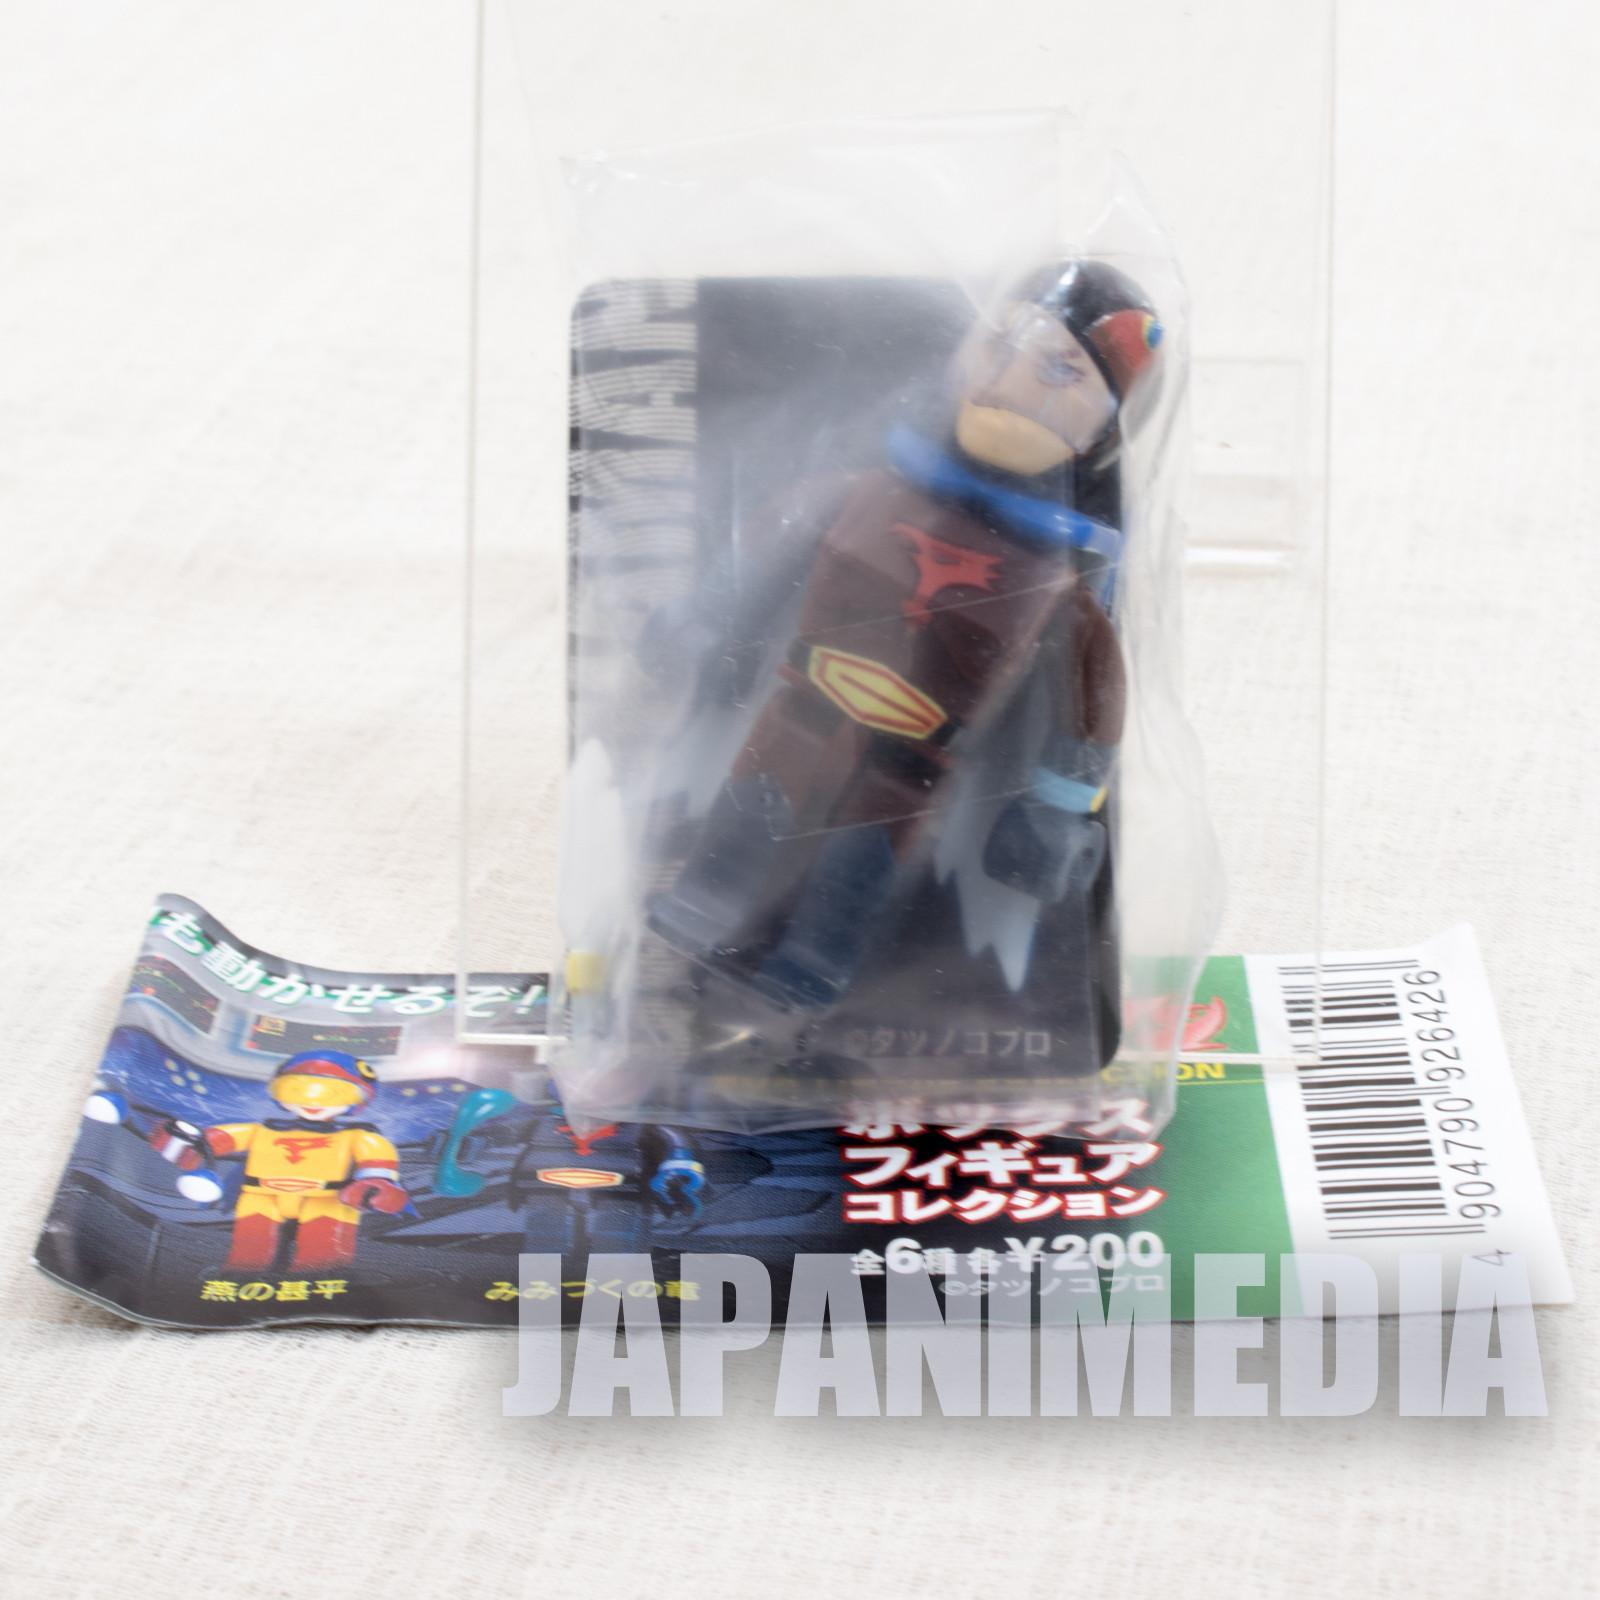 Gatchaman Joe the Condor G-2 Box Figure Collection Yujin JAPAN ANIME MANGA